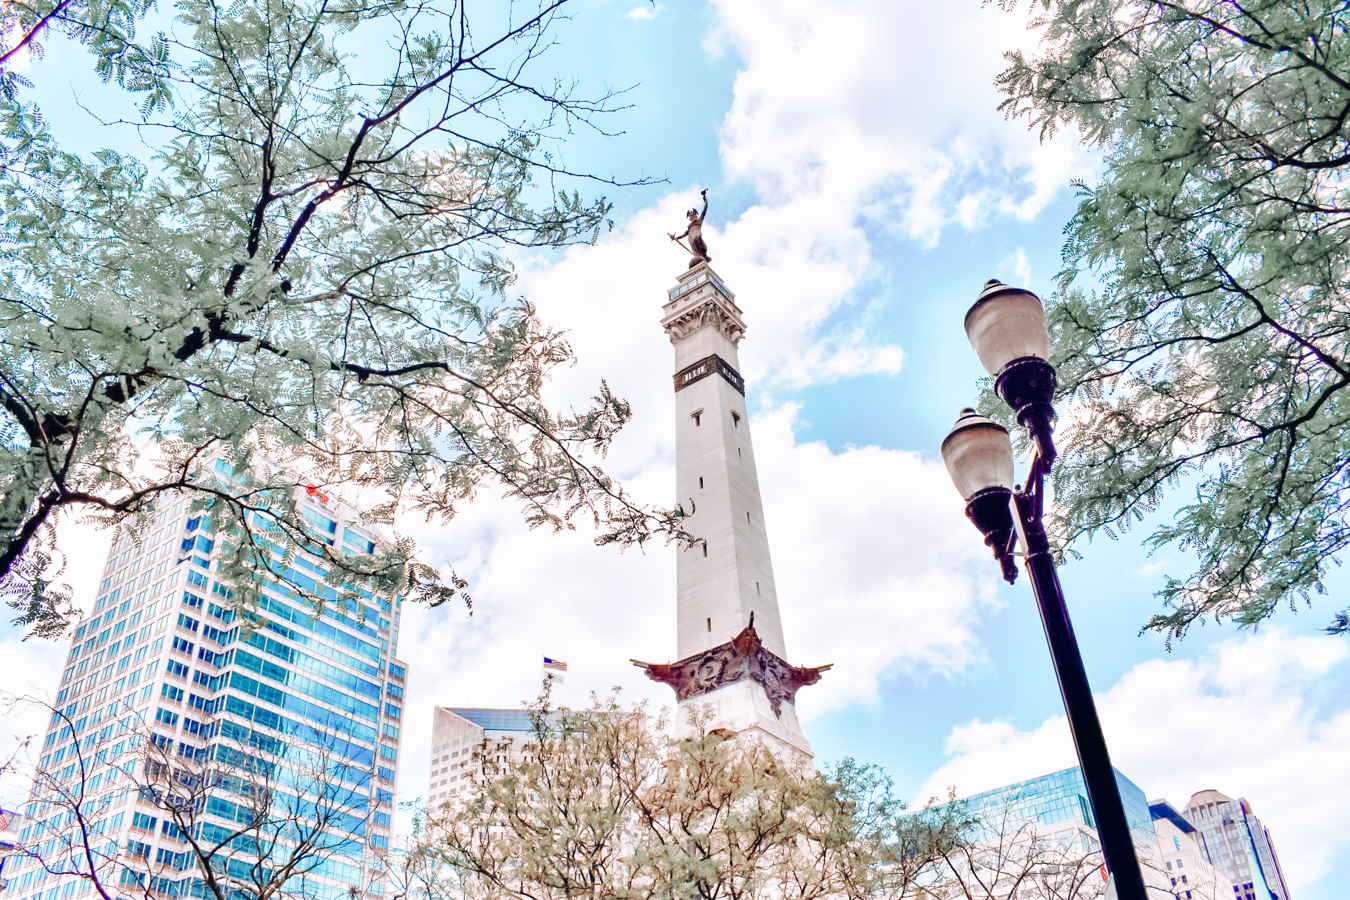 Monument in Indianapolis